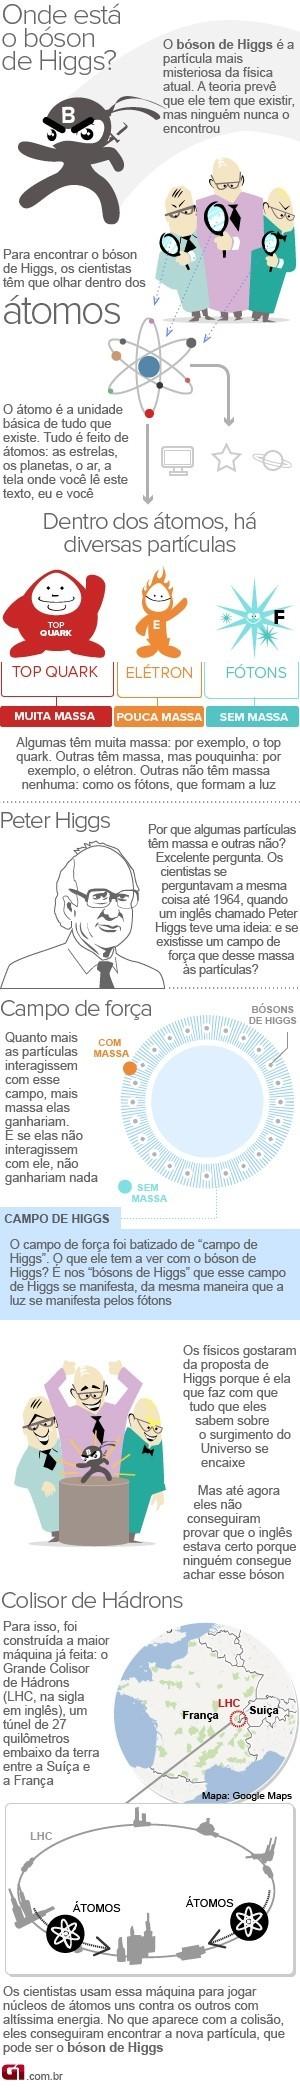 Infográfico-Bóson-de-Higgs-wallpaper-wp426486